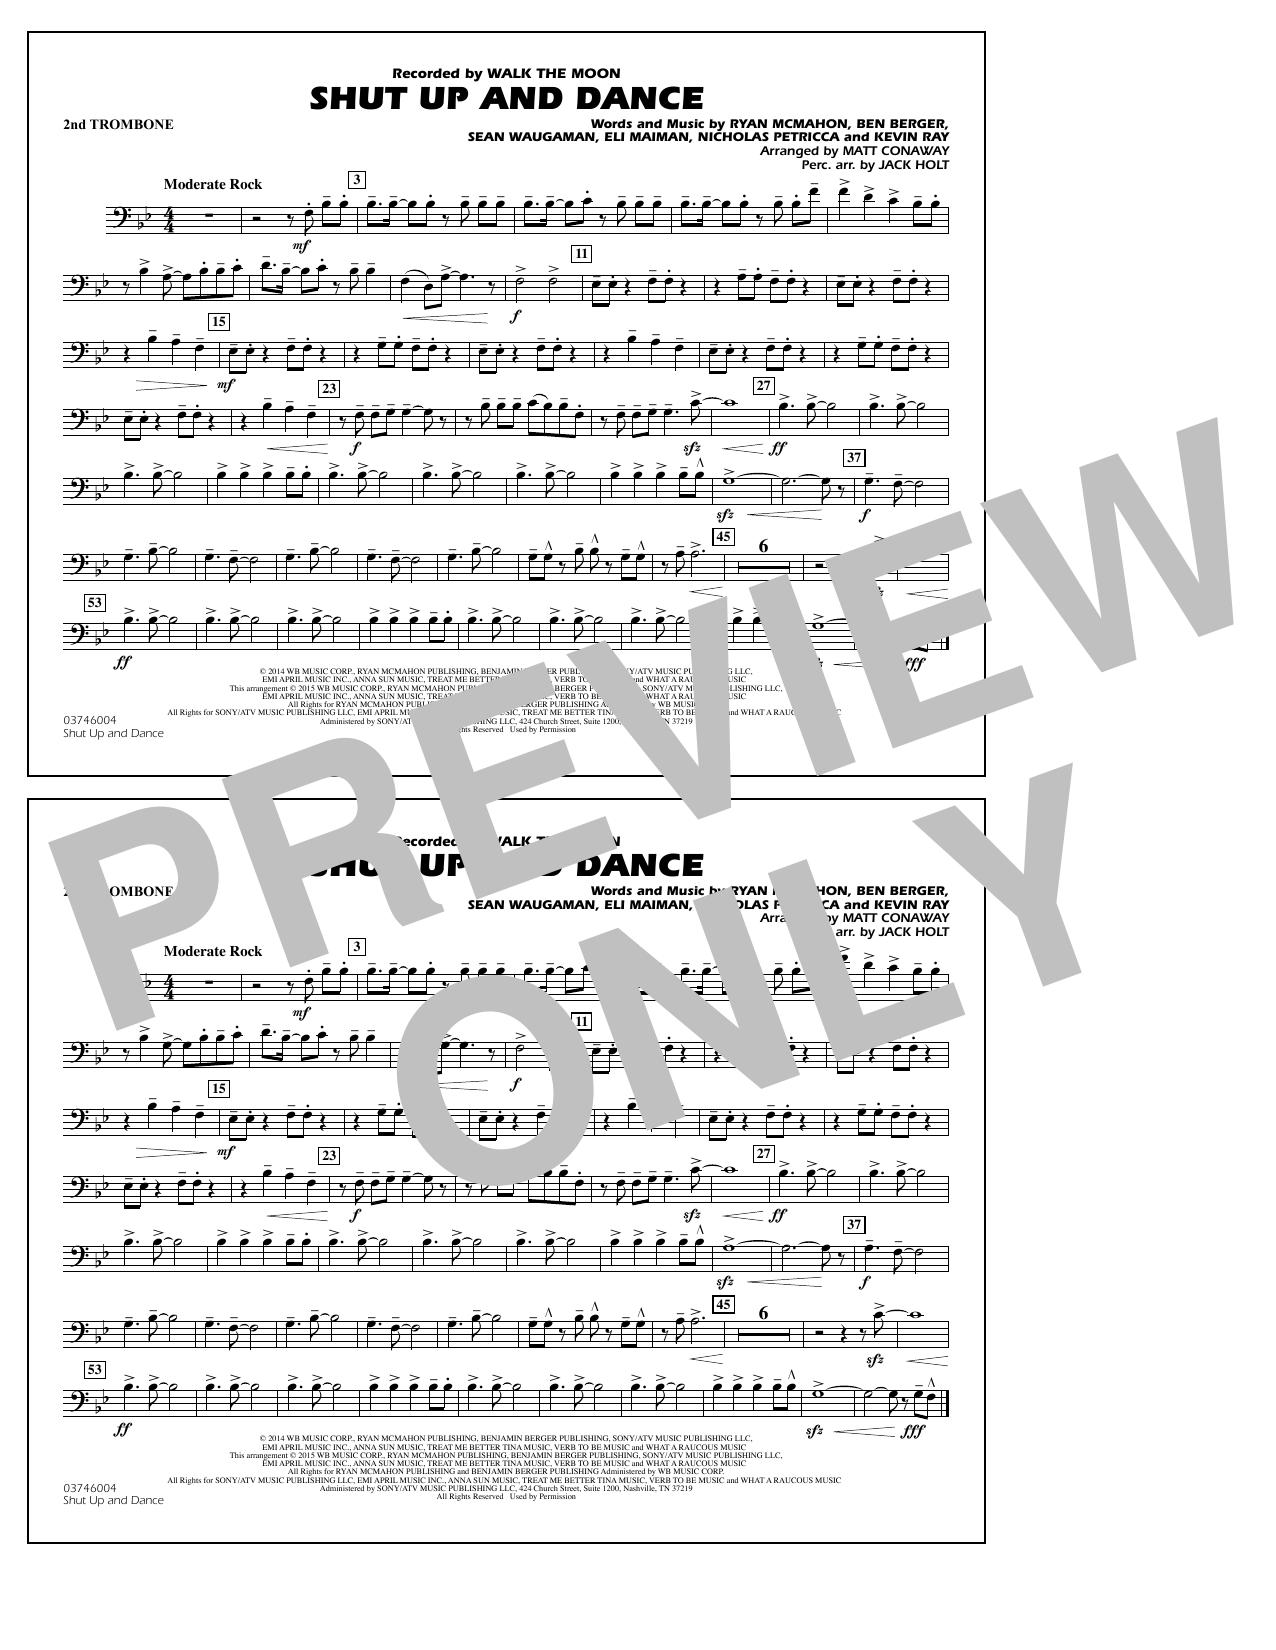 Walk The Moon Shut Up and Dance (Arr. Matt Conaway) - 2nd Trombone sheet music notes and chords